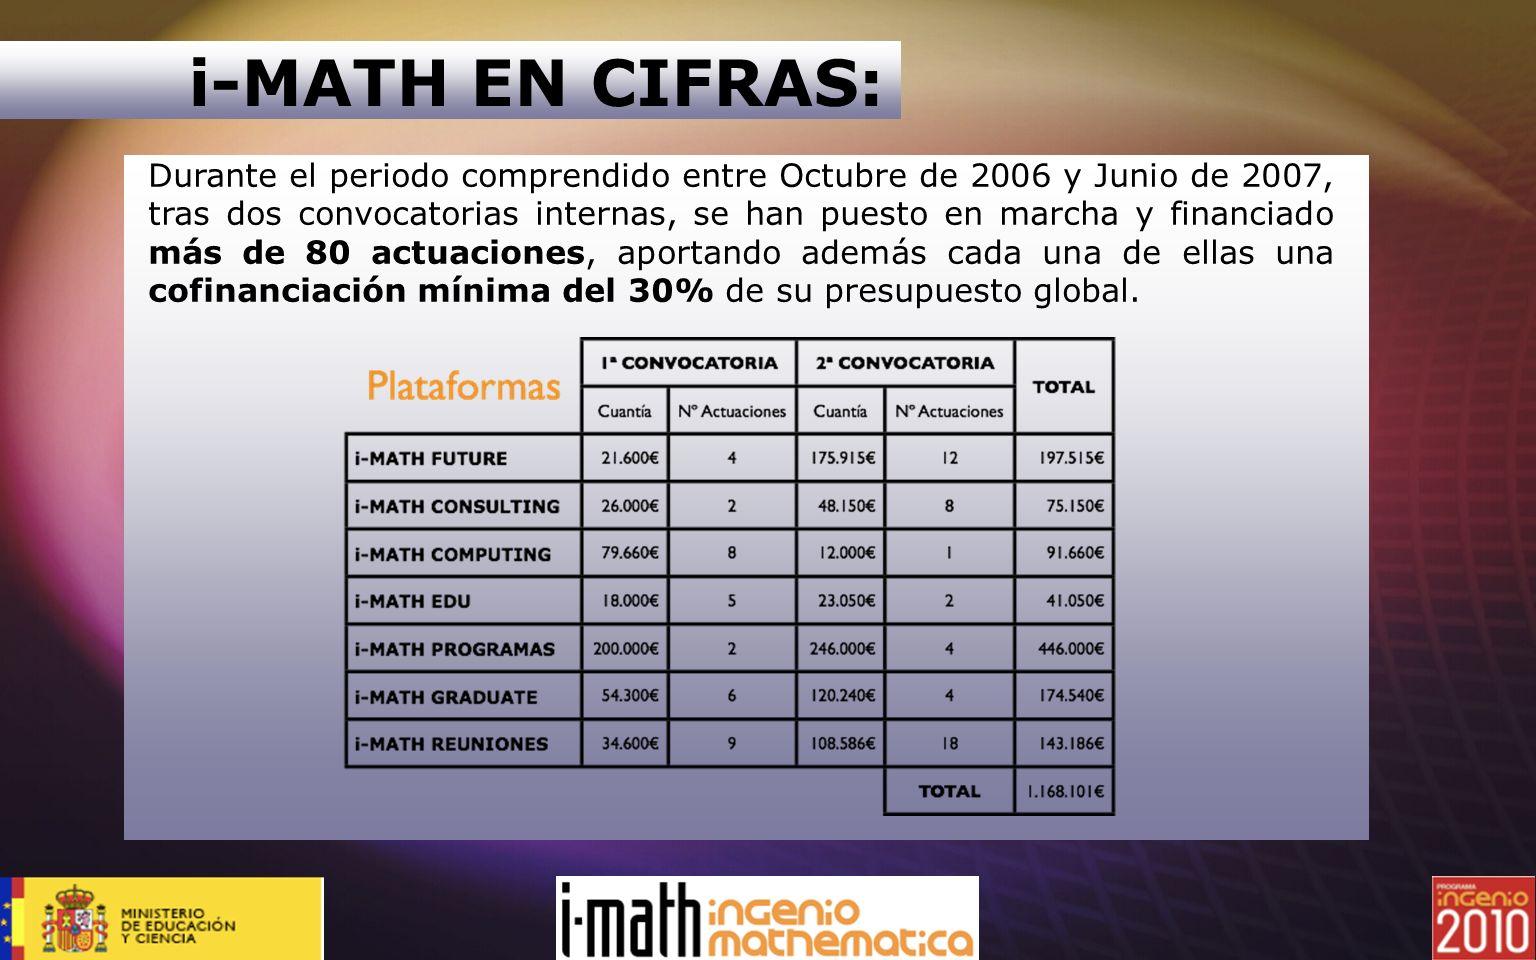 i-MATH EN CIFRAS: